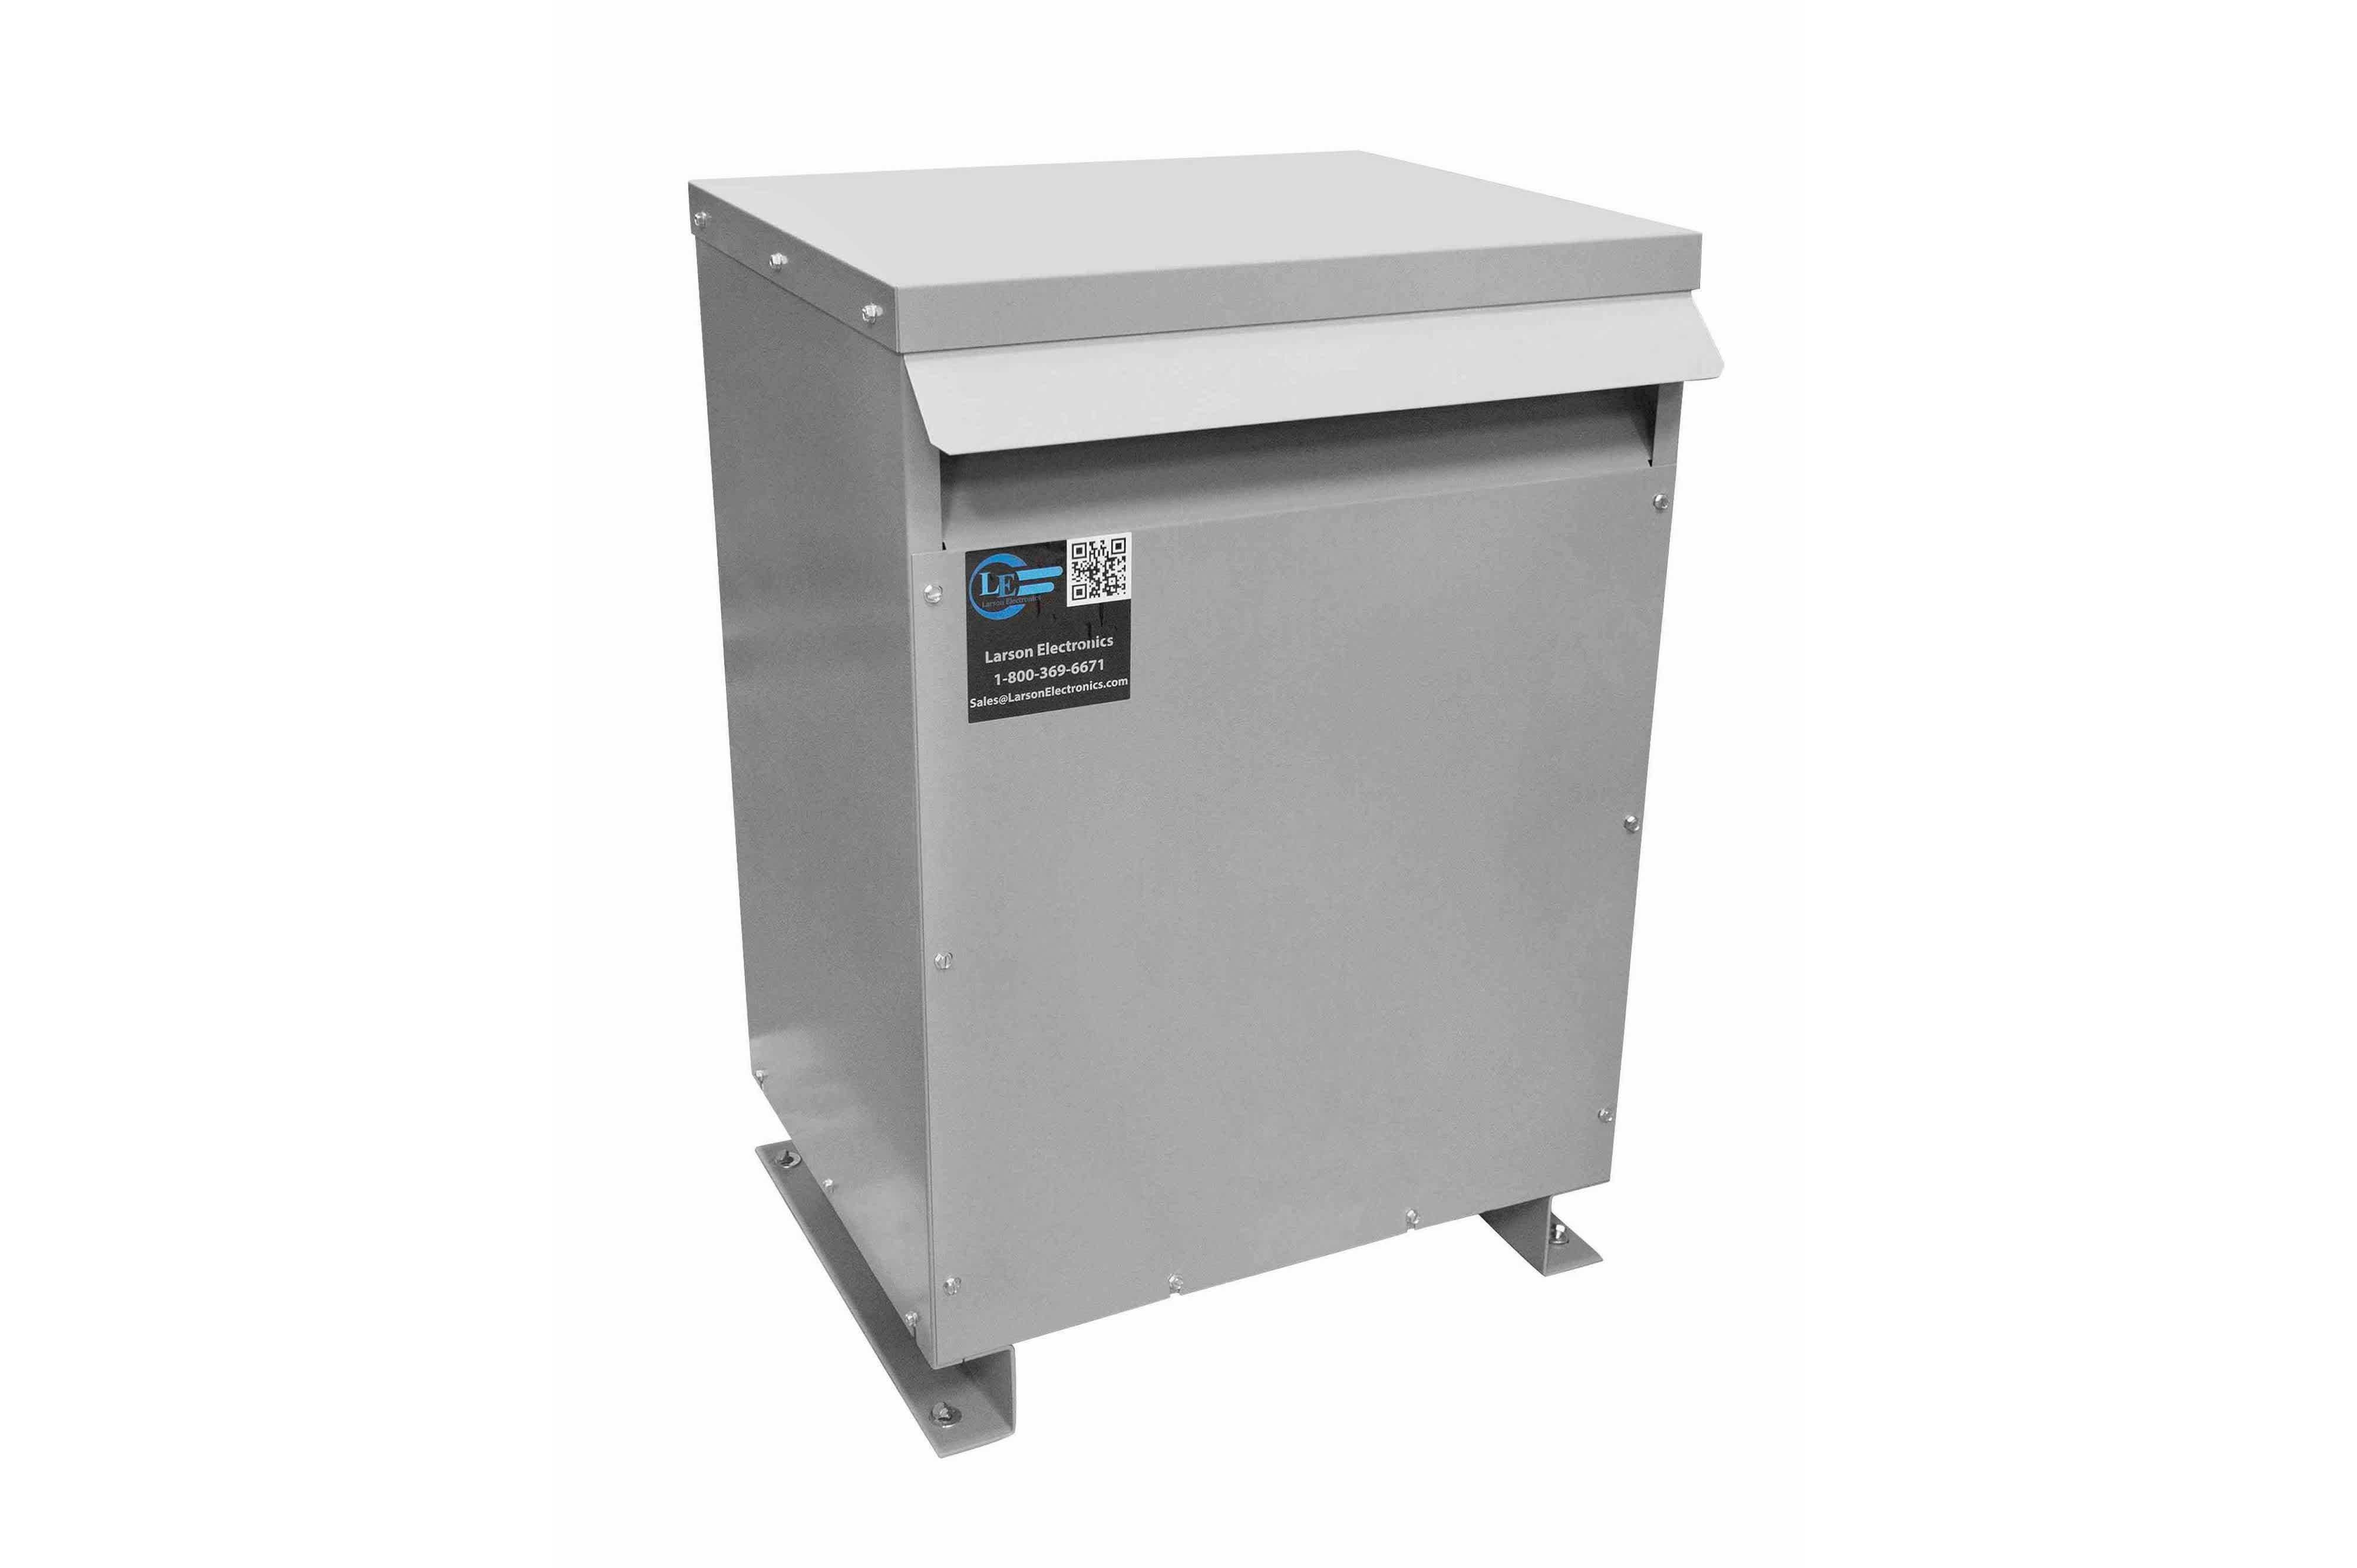 18 kVA 3PH Isolation Transformer, 208V Wye Primary, 380V Delta Secondary, N3R, Ventilated, 60 Hz